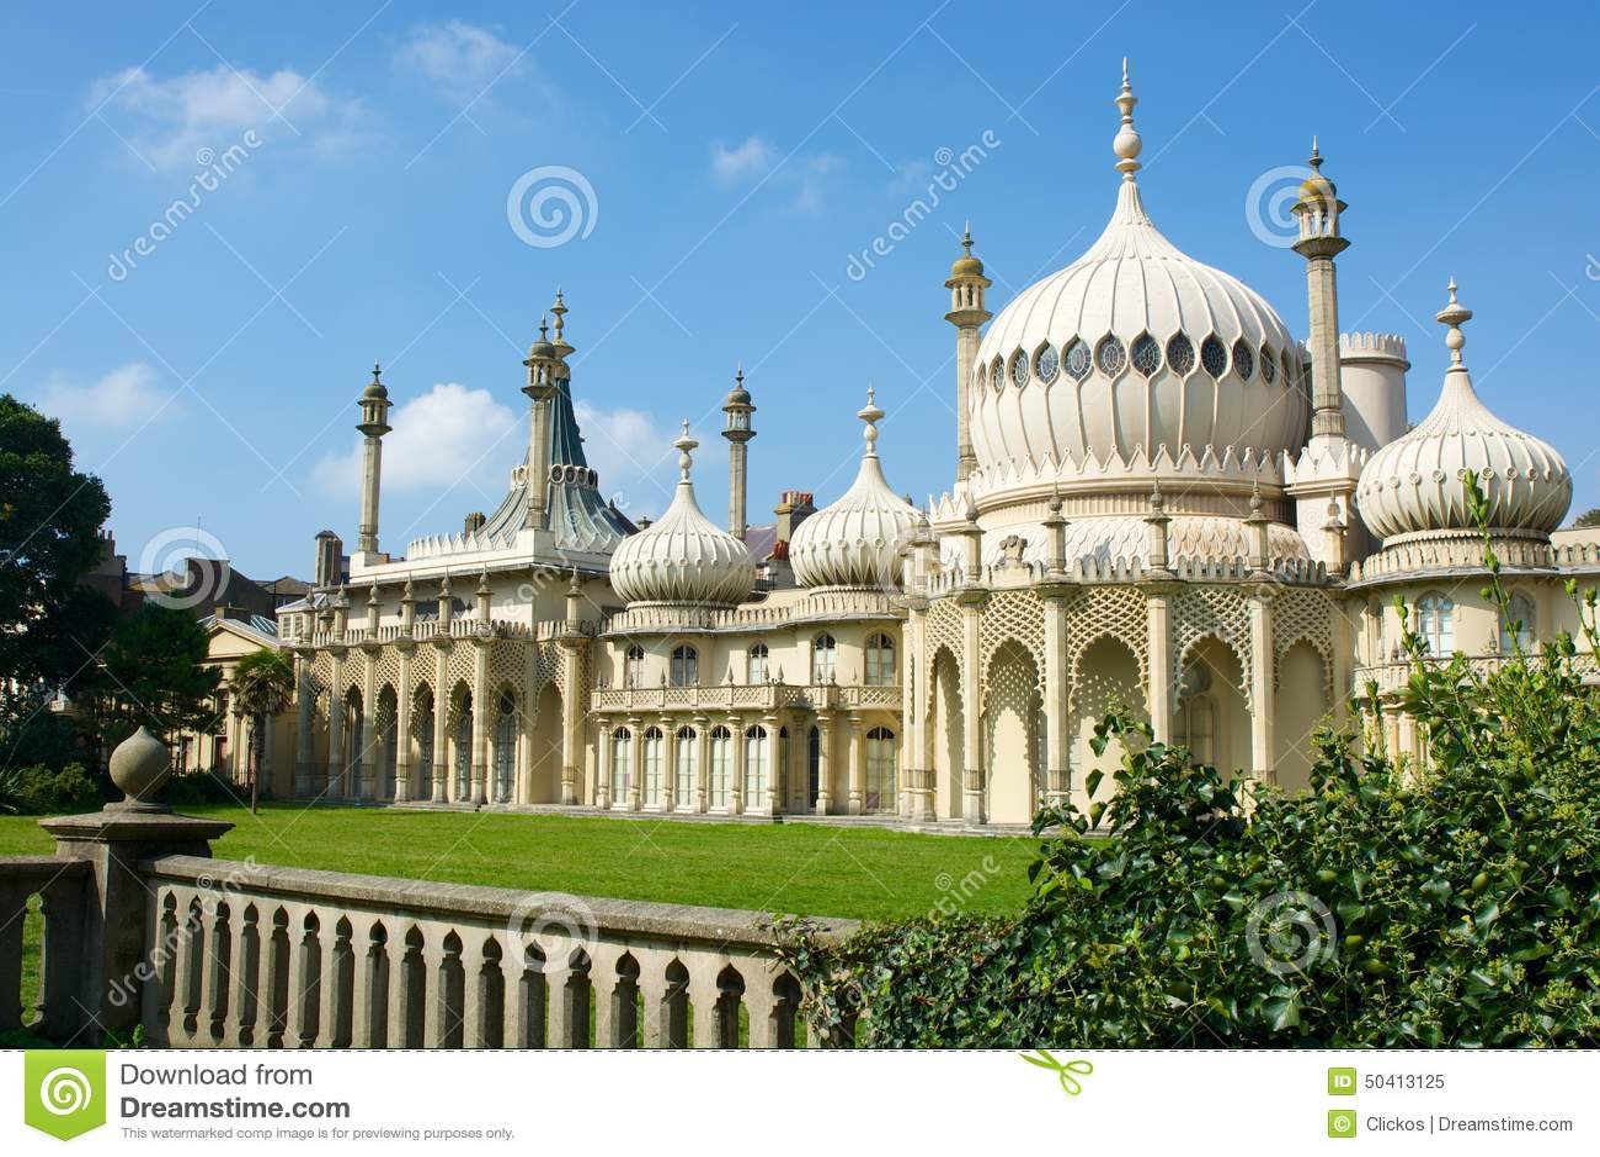 Le pavillon royal brighton